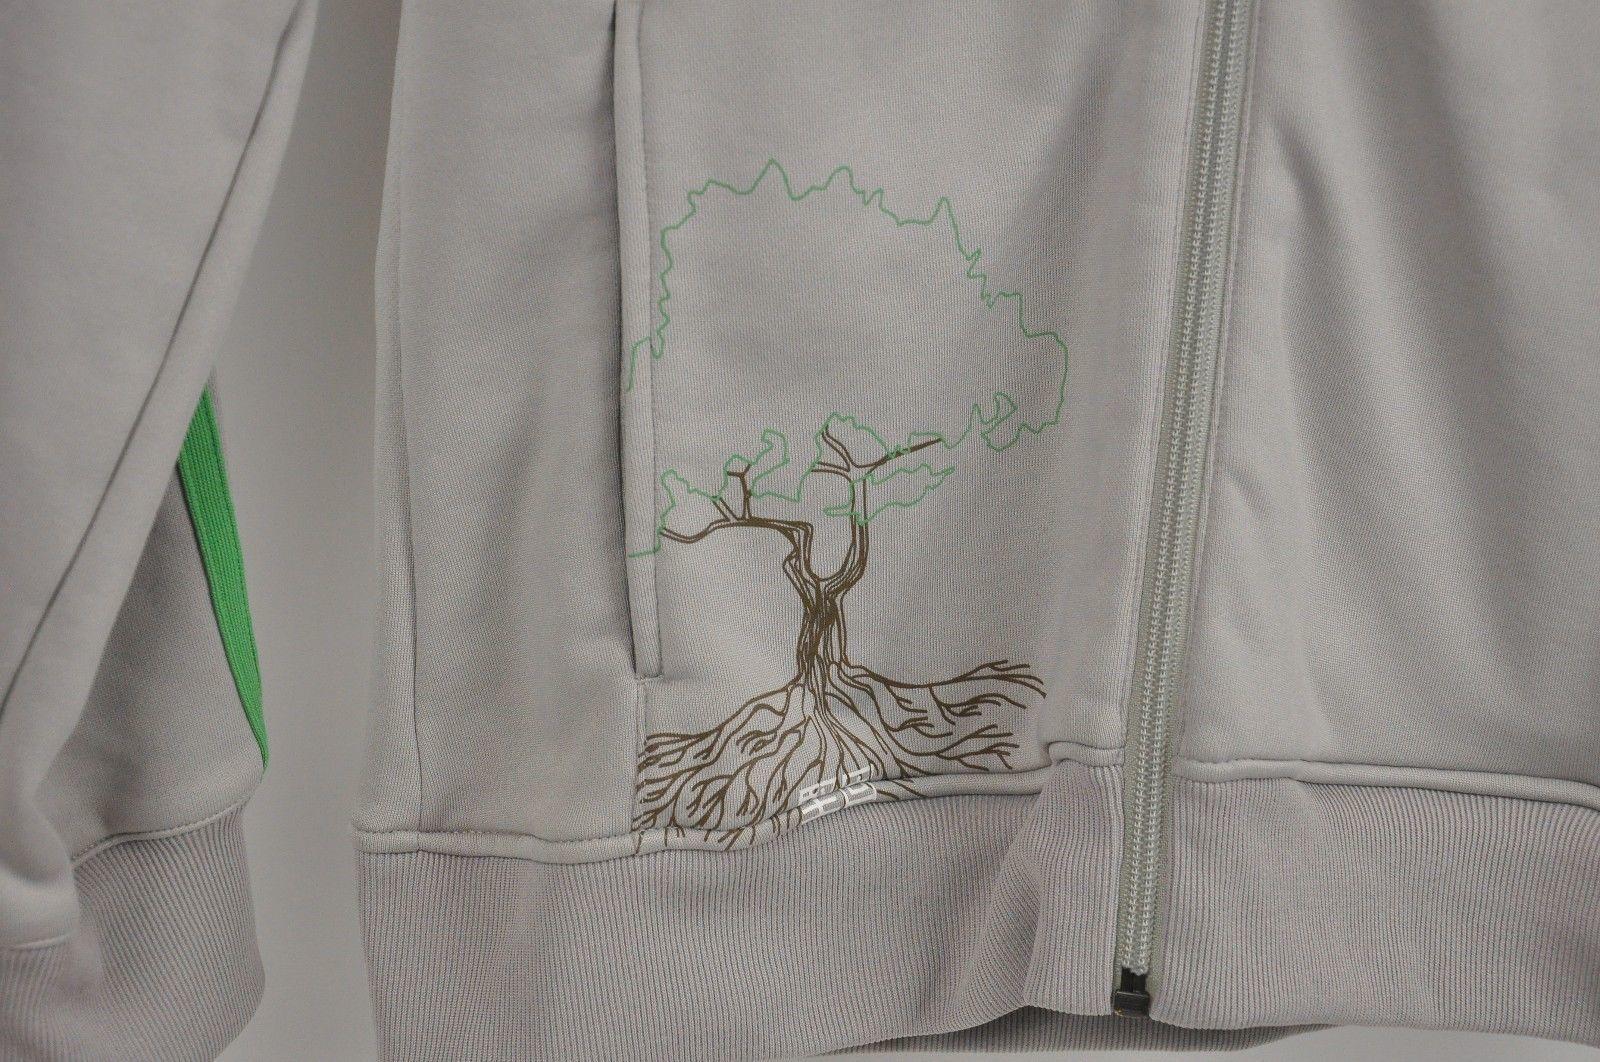 Women's ADIDAS 2008 Beijing China OLYMPICS Track Jacket Taupe/Lime Tree Size M